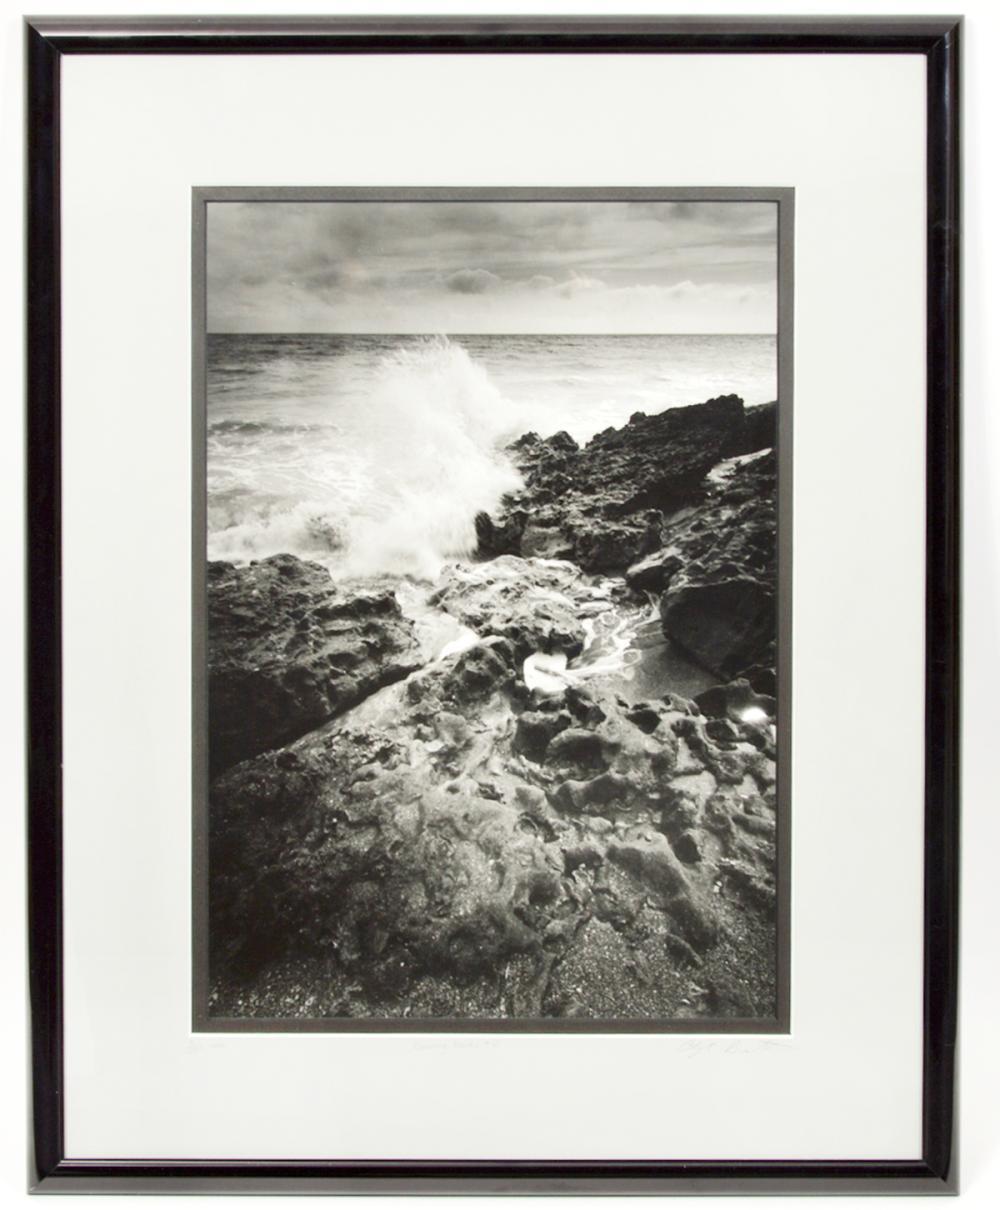 Clyde Butcher 'Blowing Rock #10' Photograph